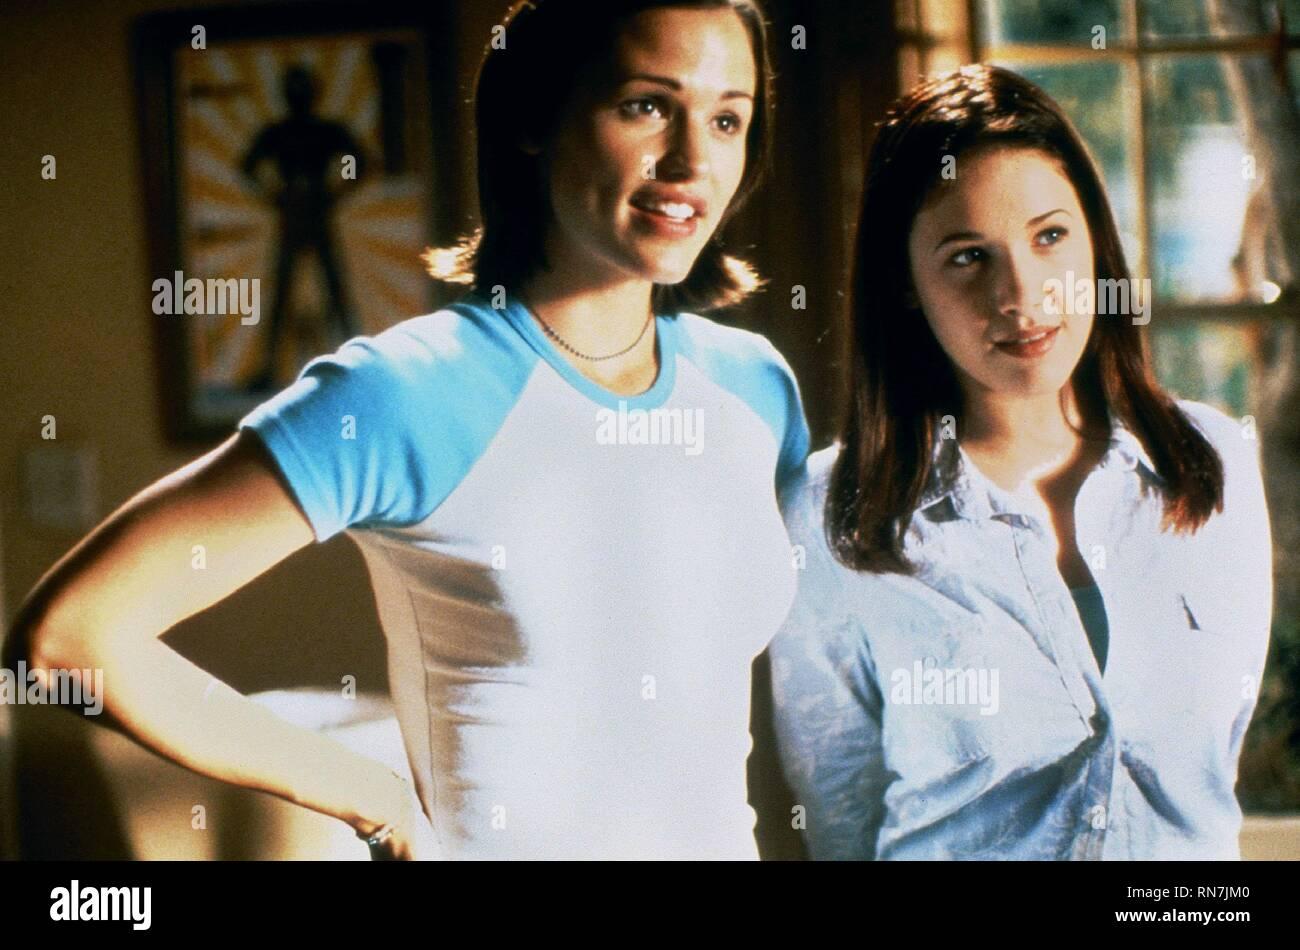 Amigo, ¿dónde está mi coche?, Jennifer Garner, Marla Sokoloff, 2000 Foto de stock